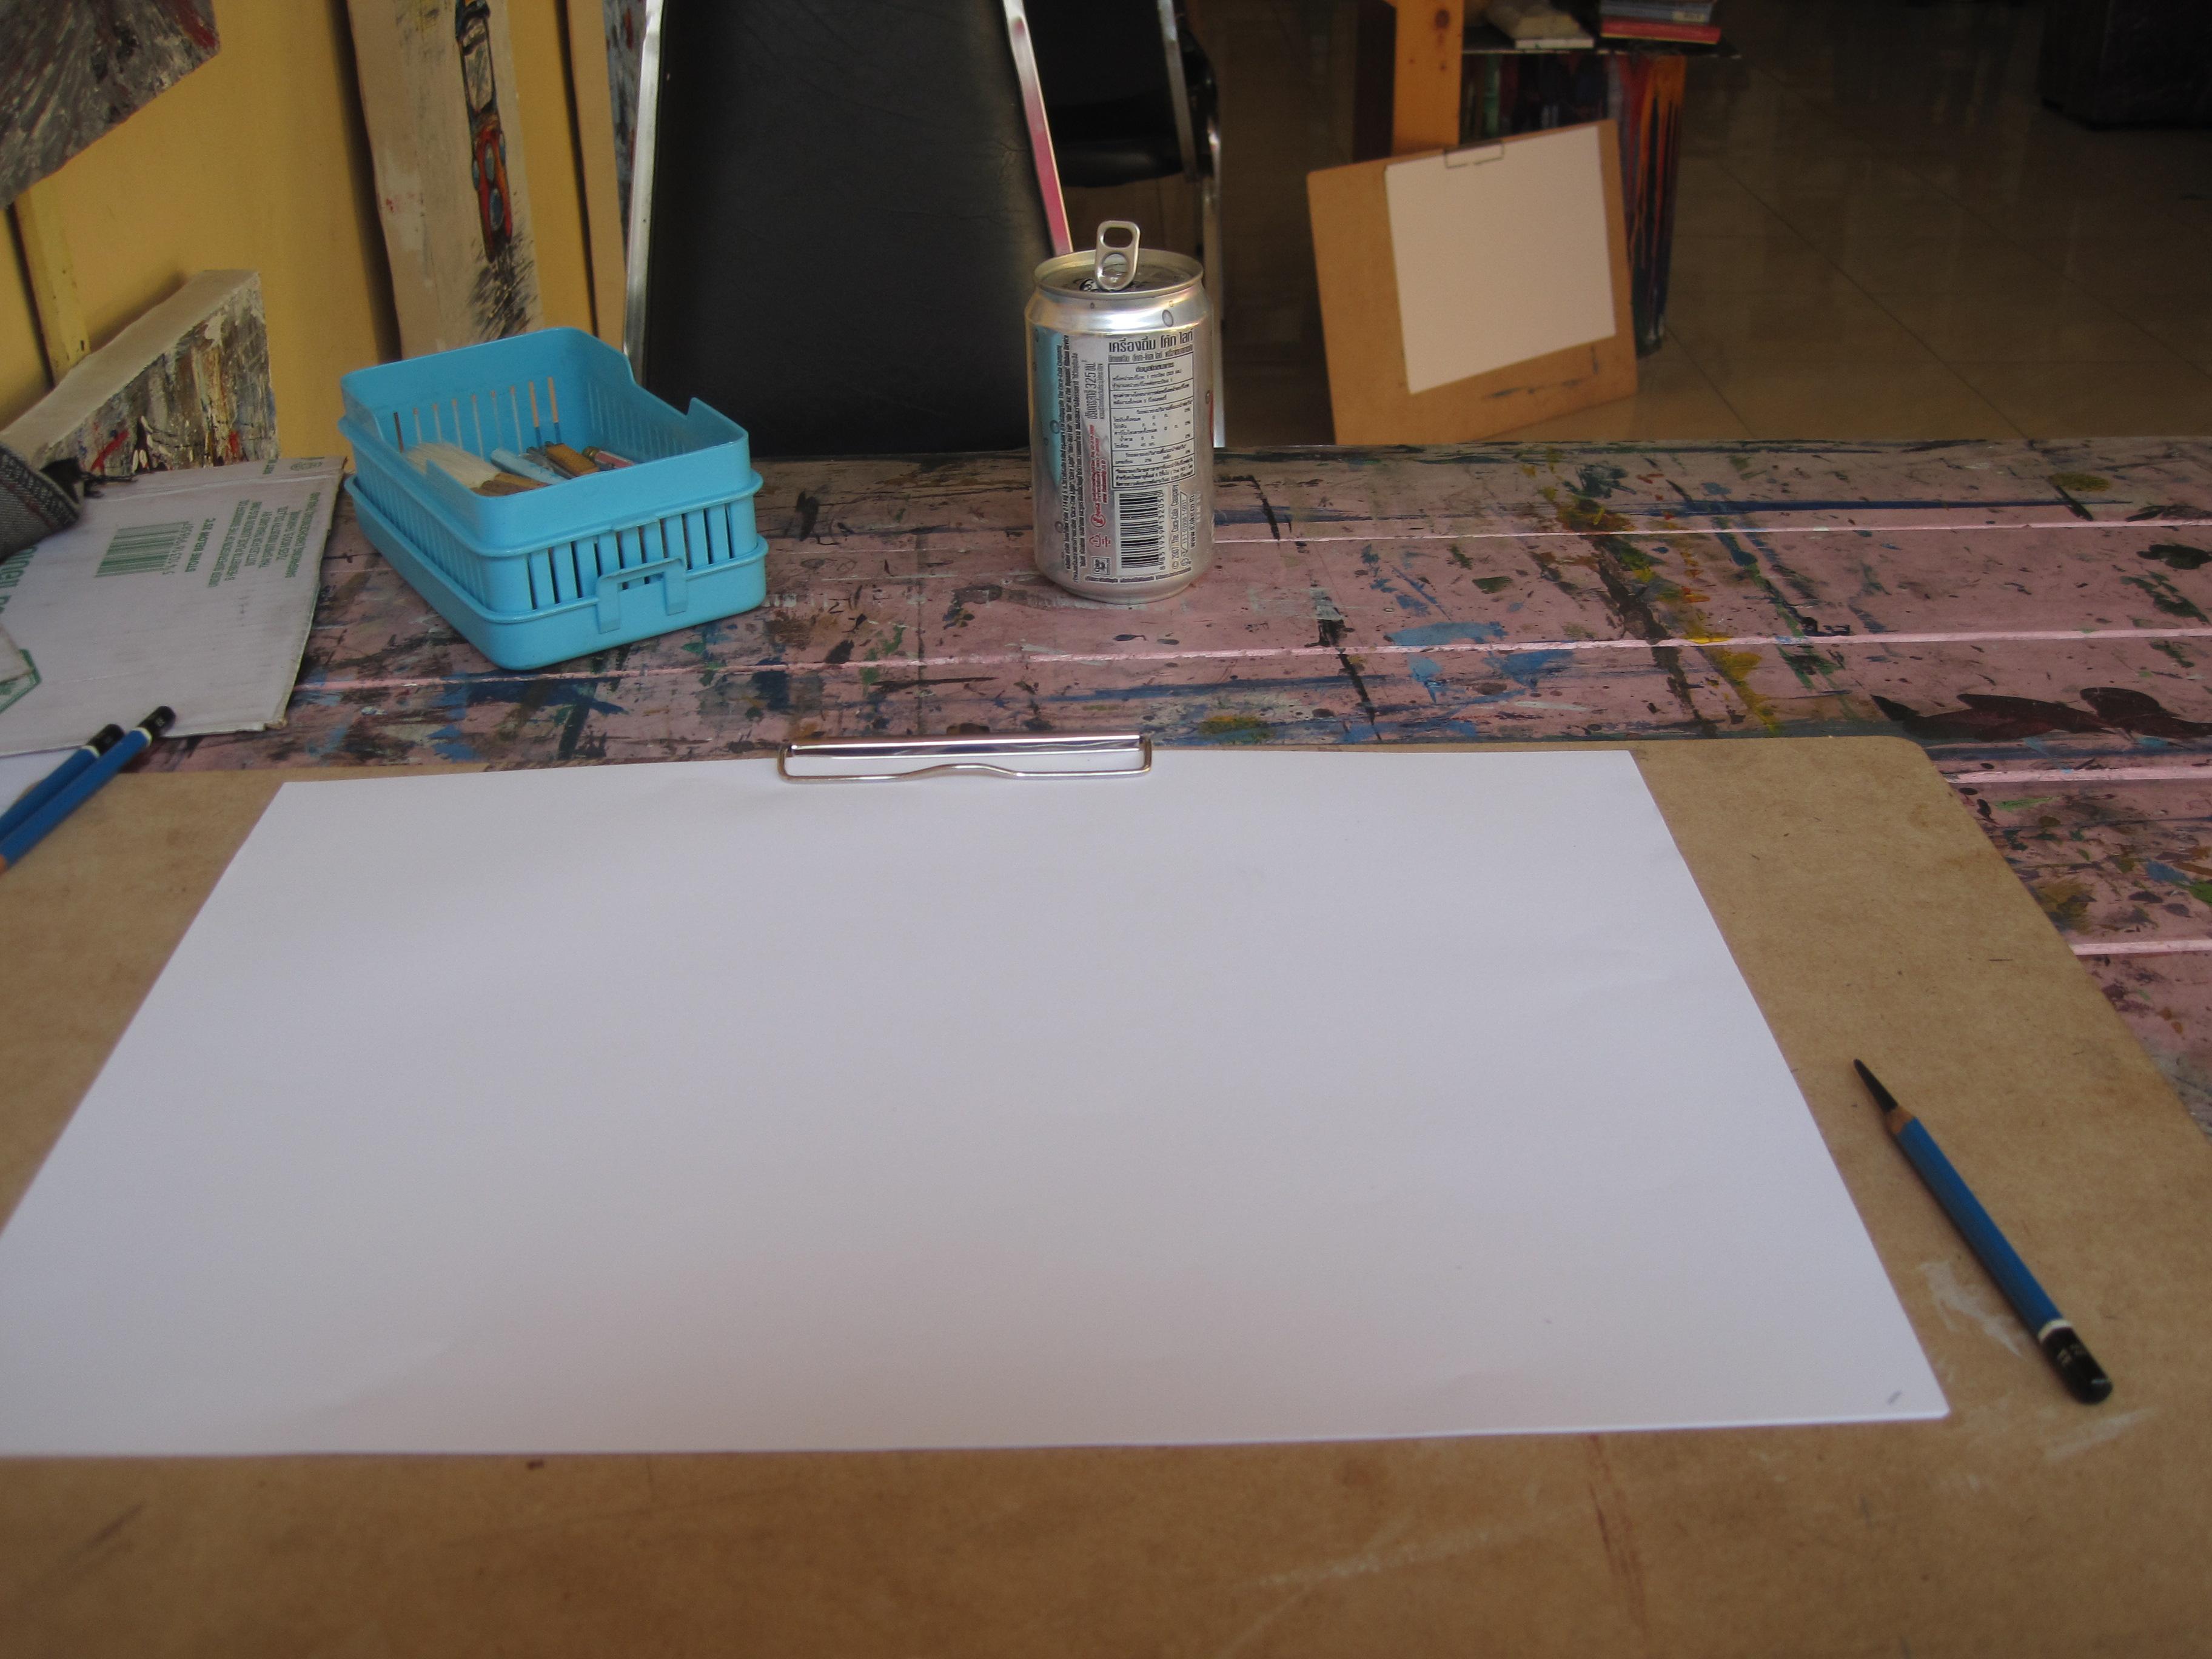 A blank sheet